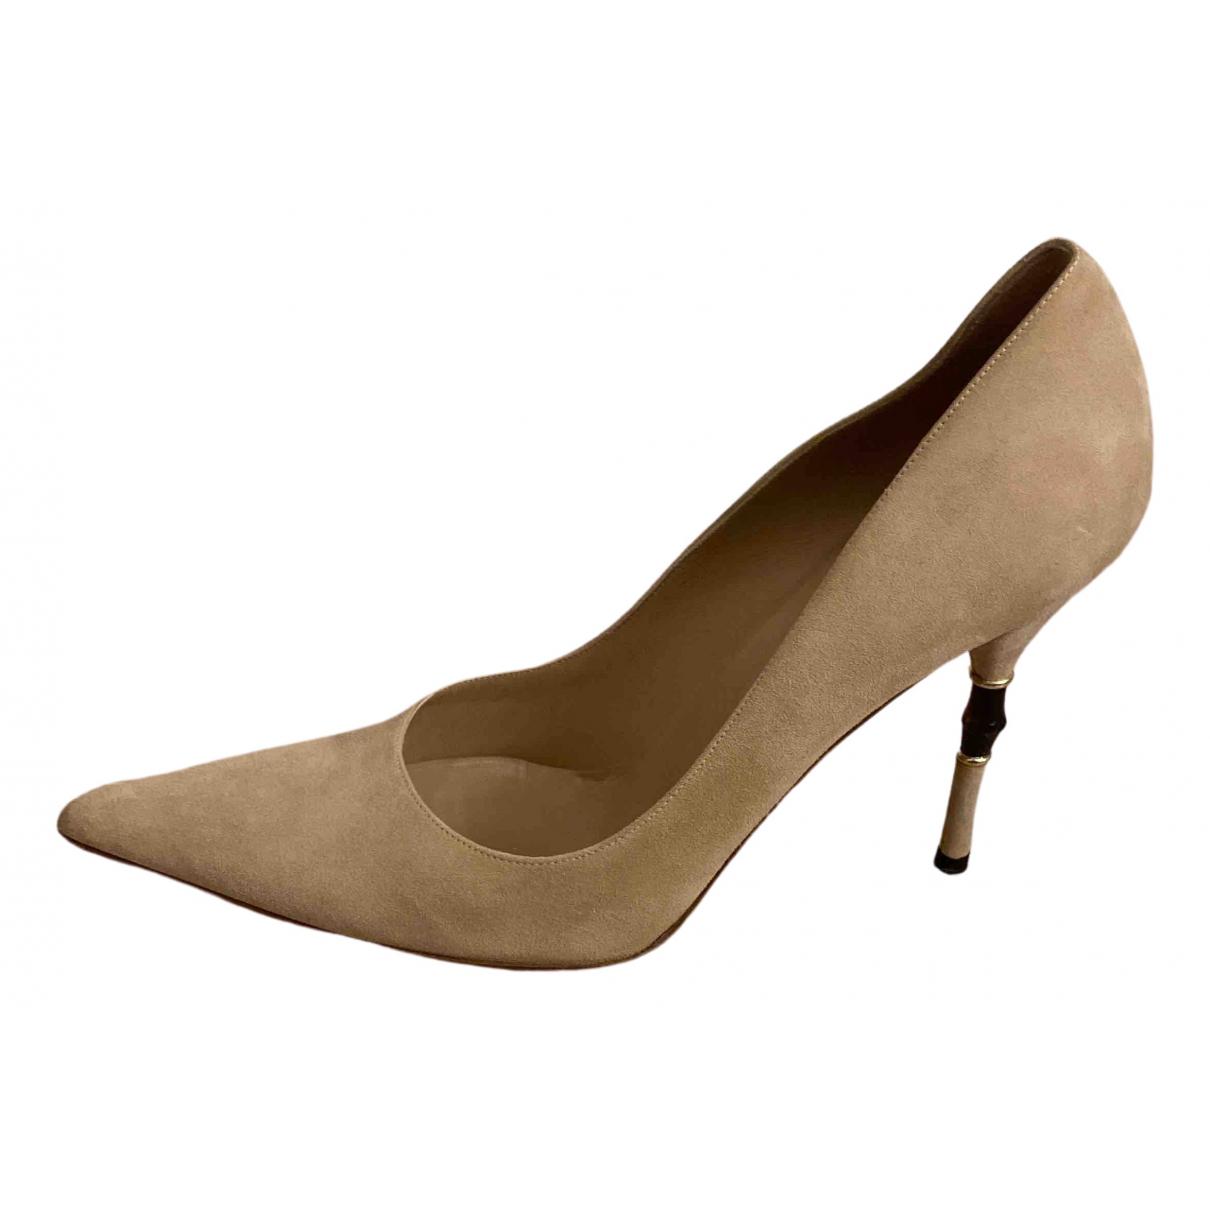 Gucci \N Beige Suede Heels for Women 41.5 EU